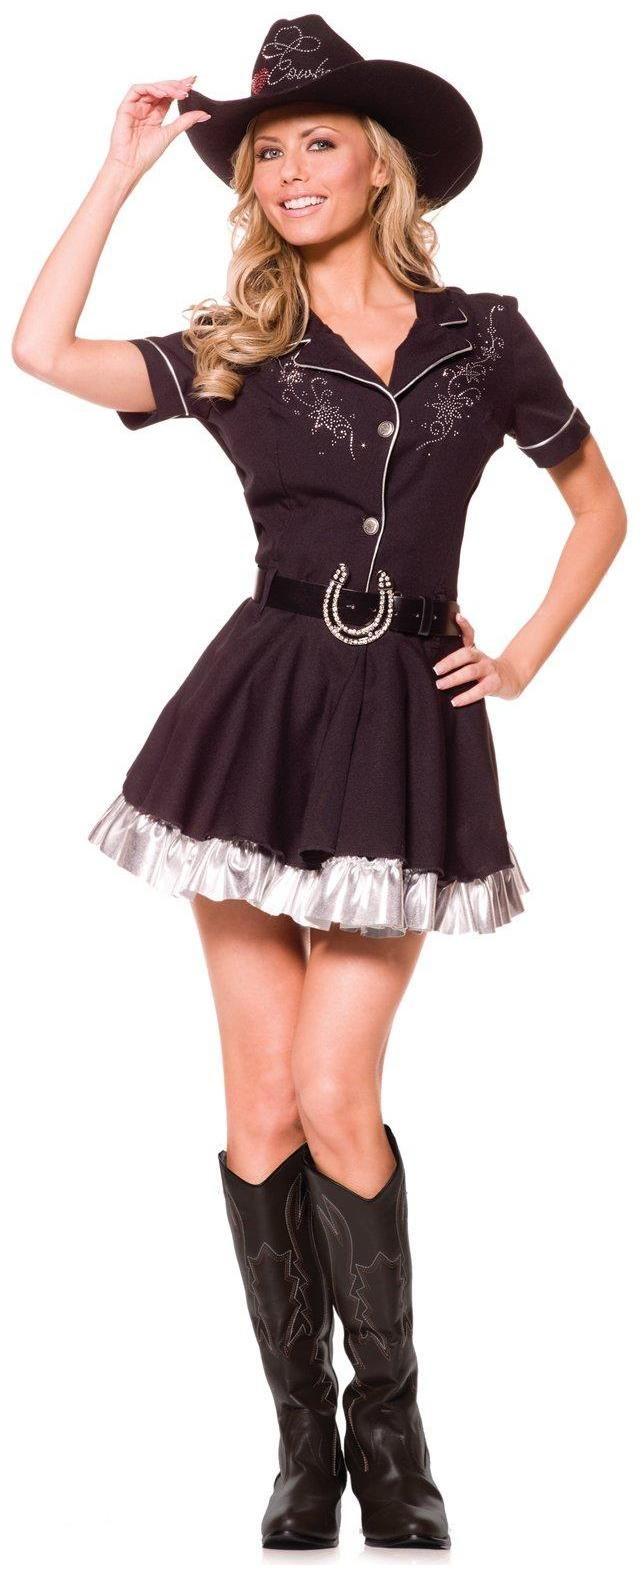 Women's Rhinestone Cowgirl Adult Costume - Black - Large for Halloween Price: $32.14